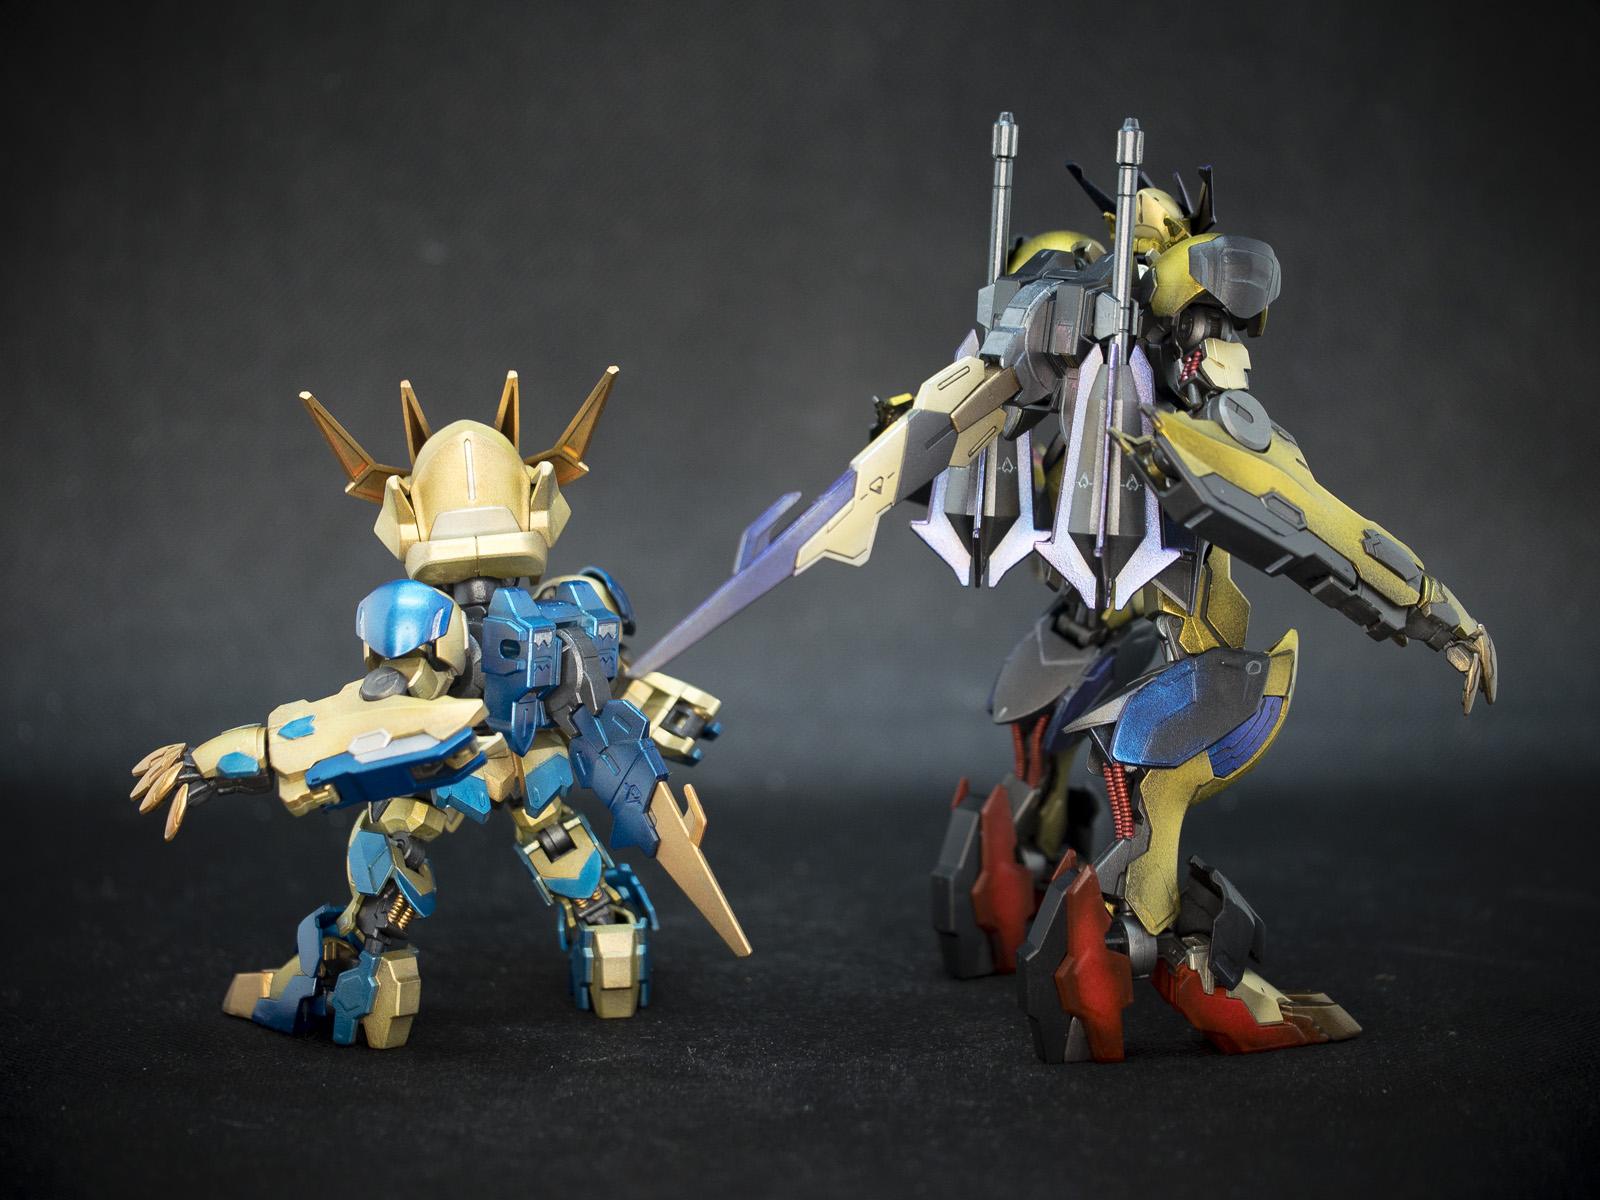 Bandai 1/144 HG IBO ASW-G-08 Gundam Barbatos Lupus Rex